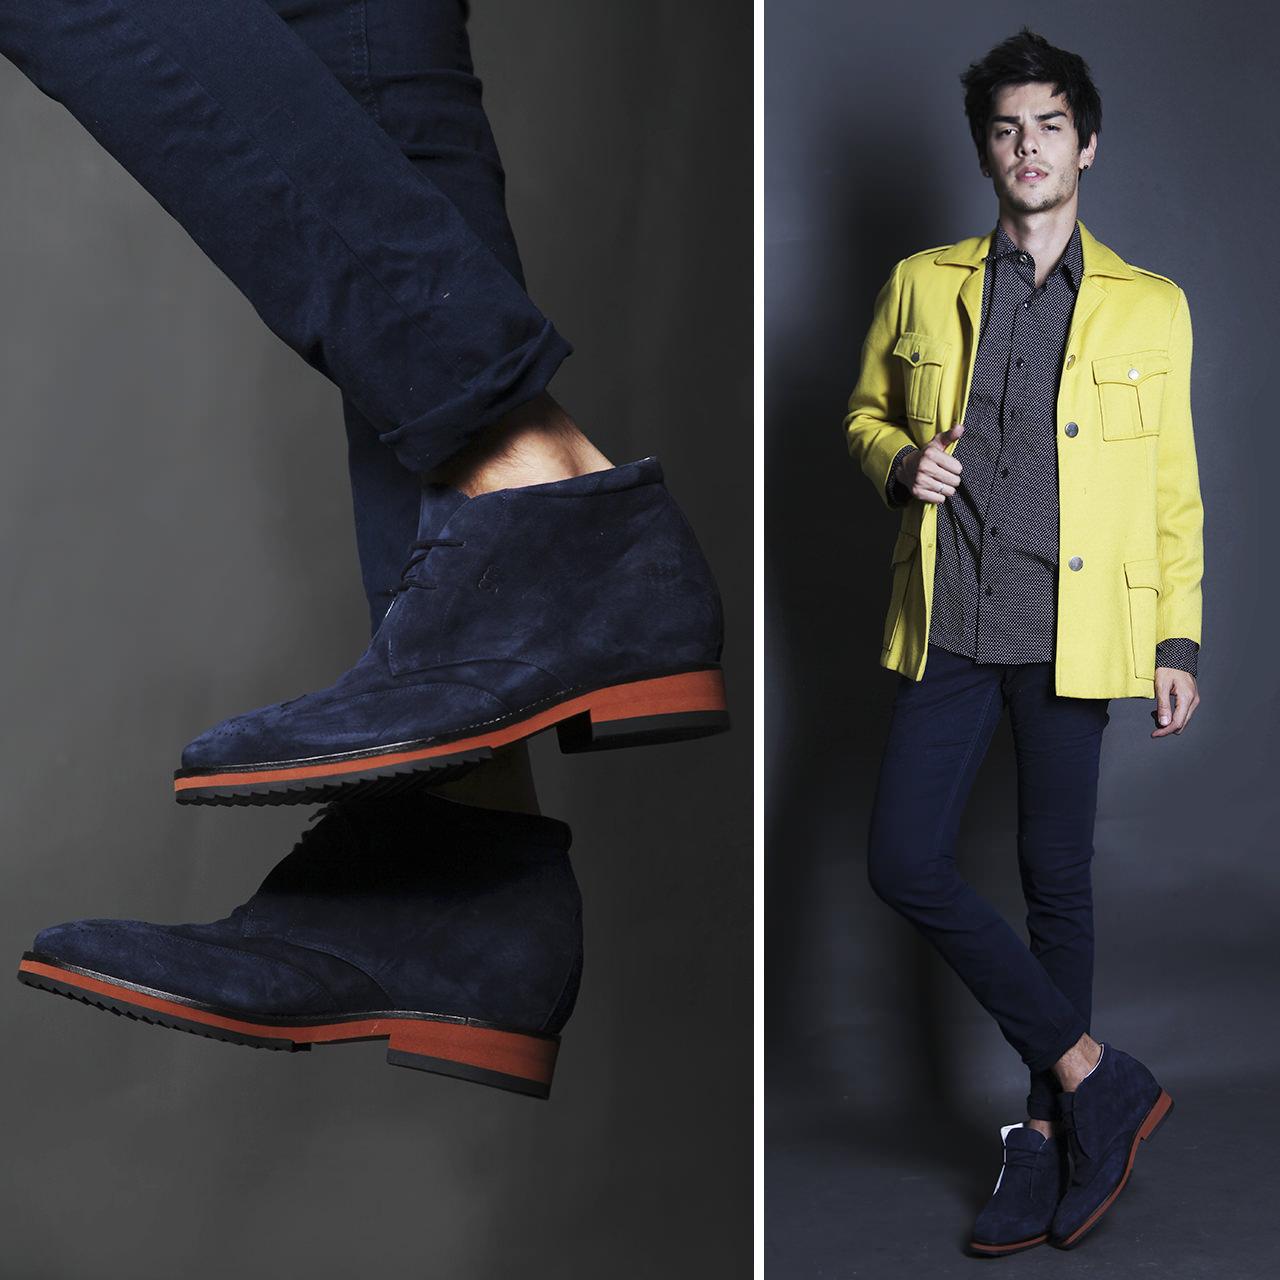 a4aa01427c3 Brooklyn - shoes for short men